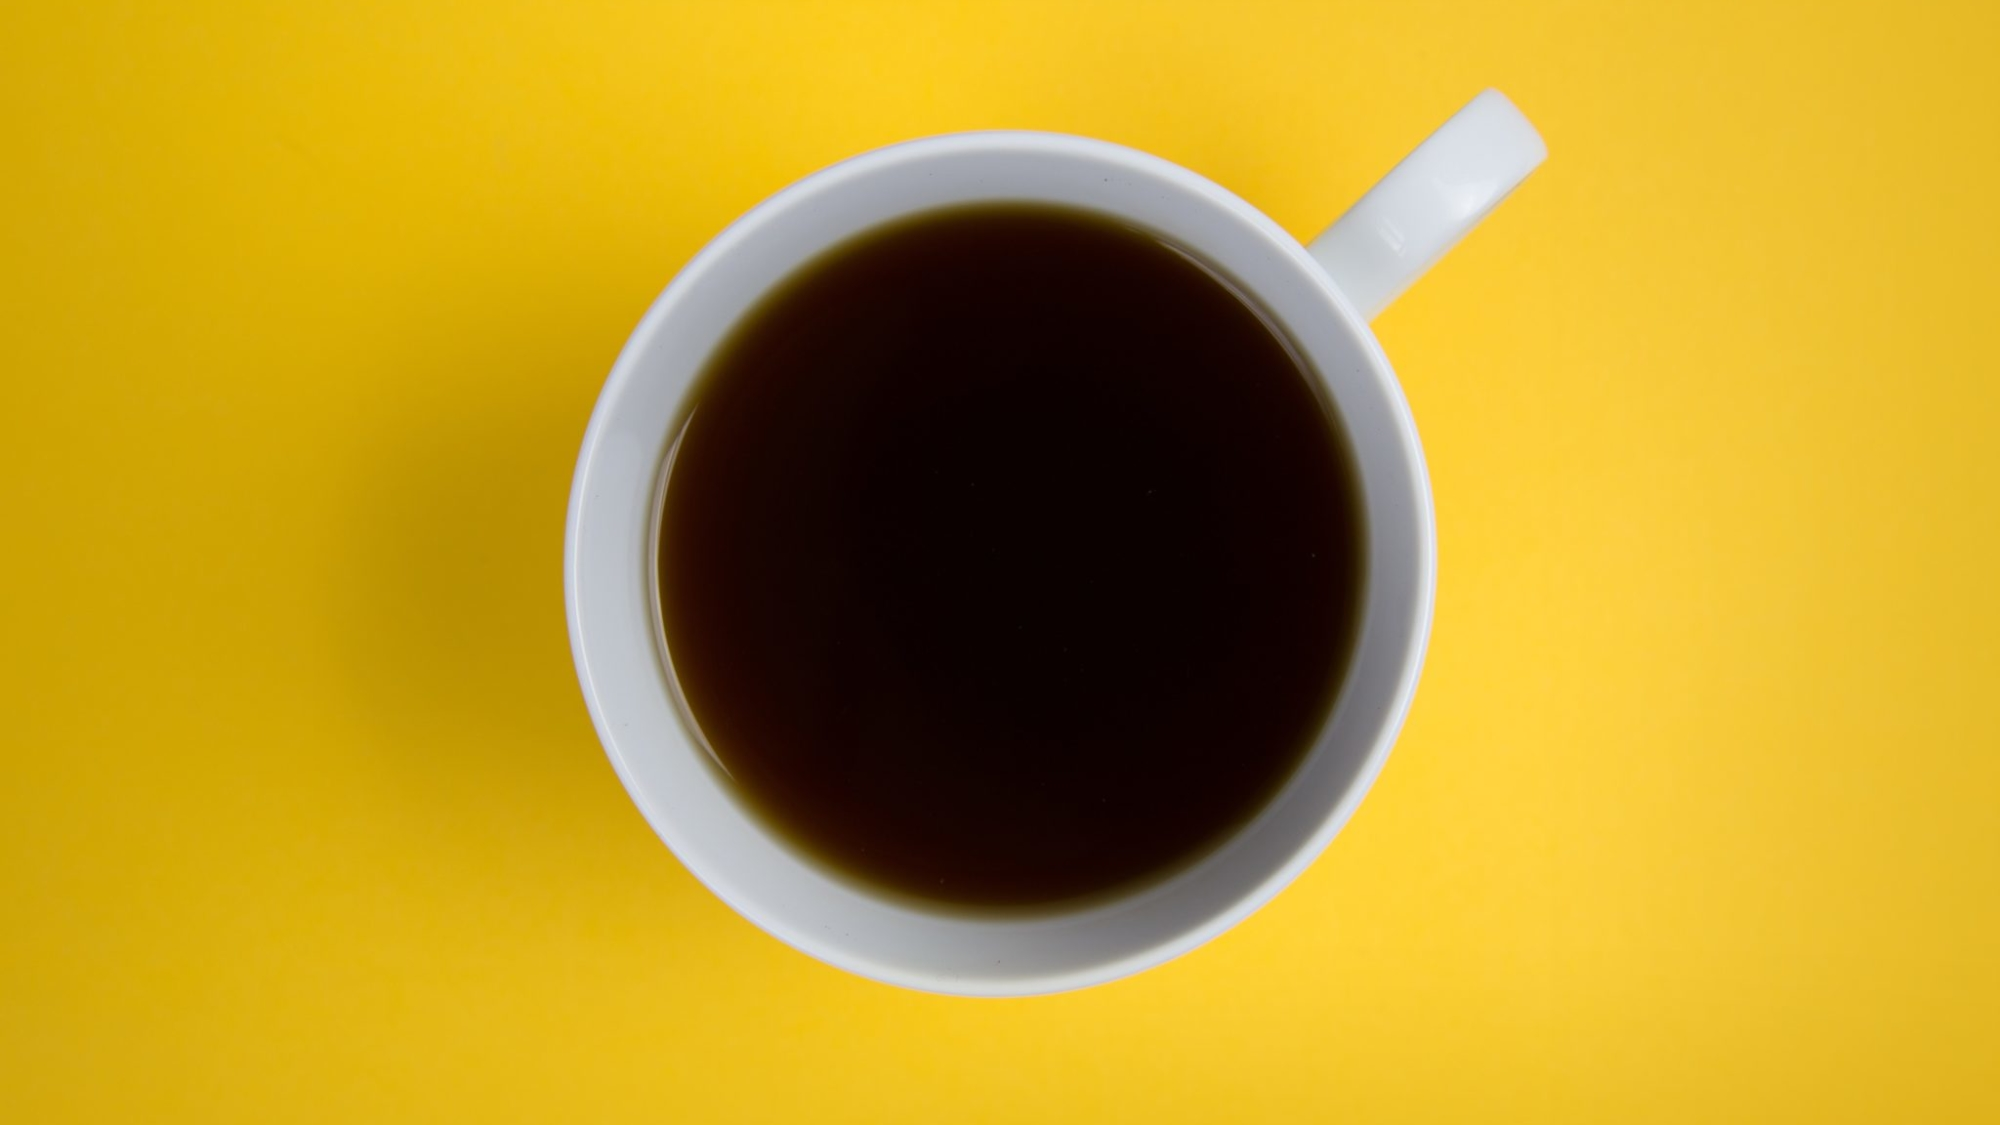 caffeine-close-up-coffee-539432